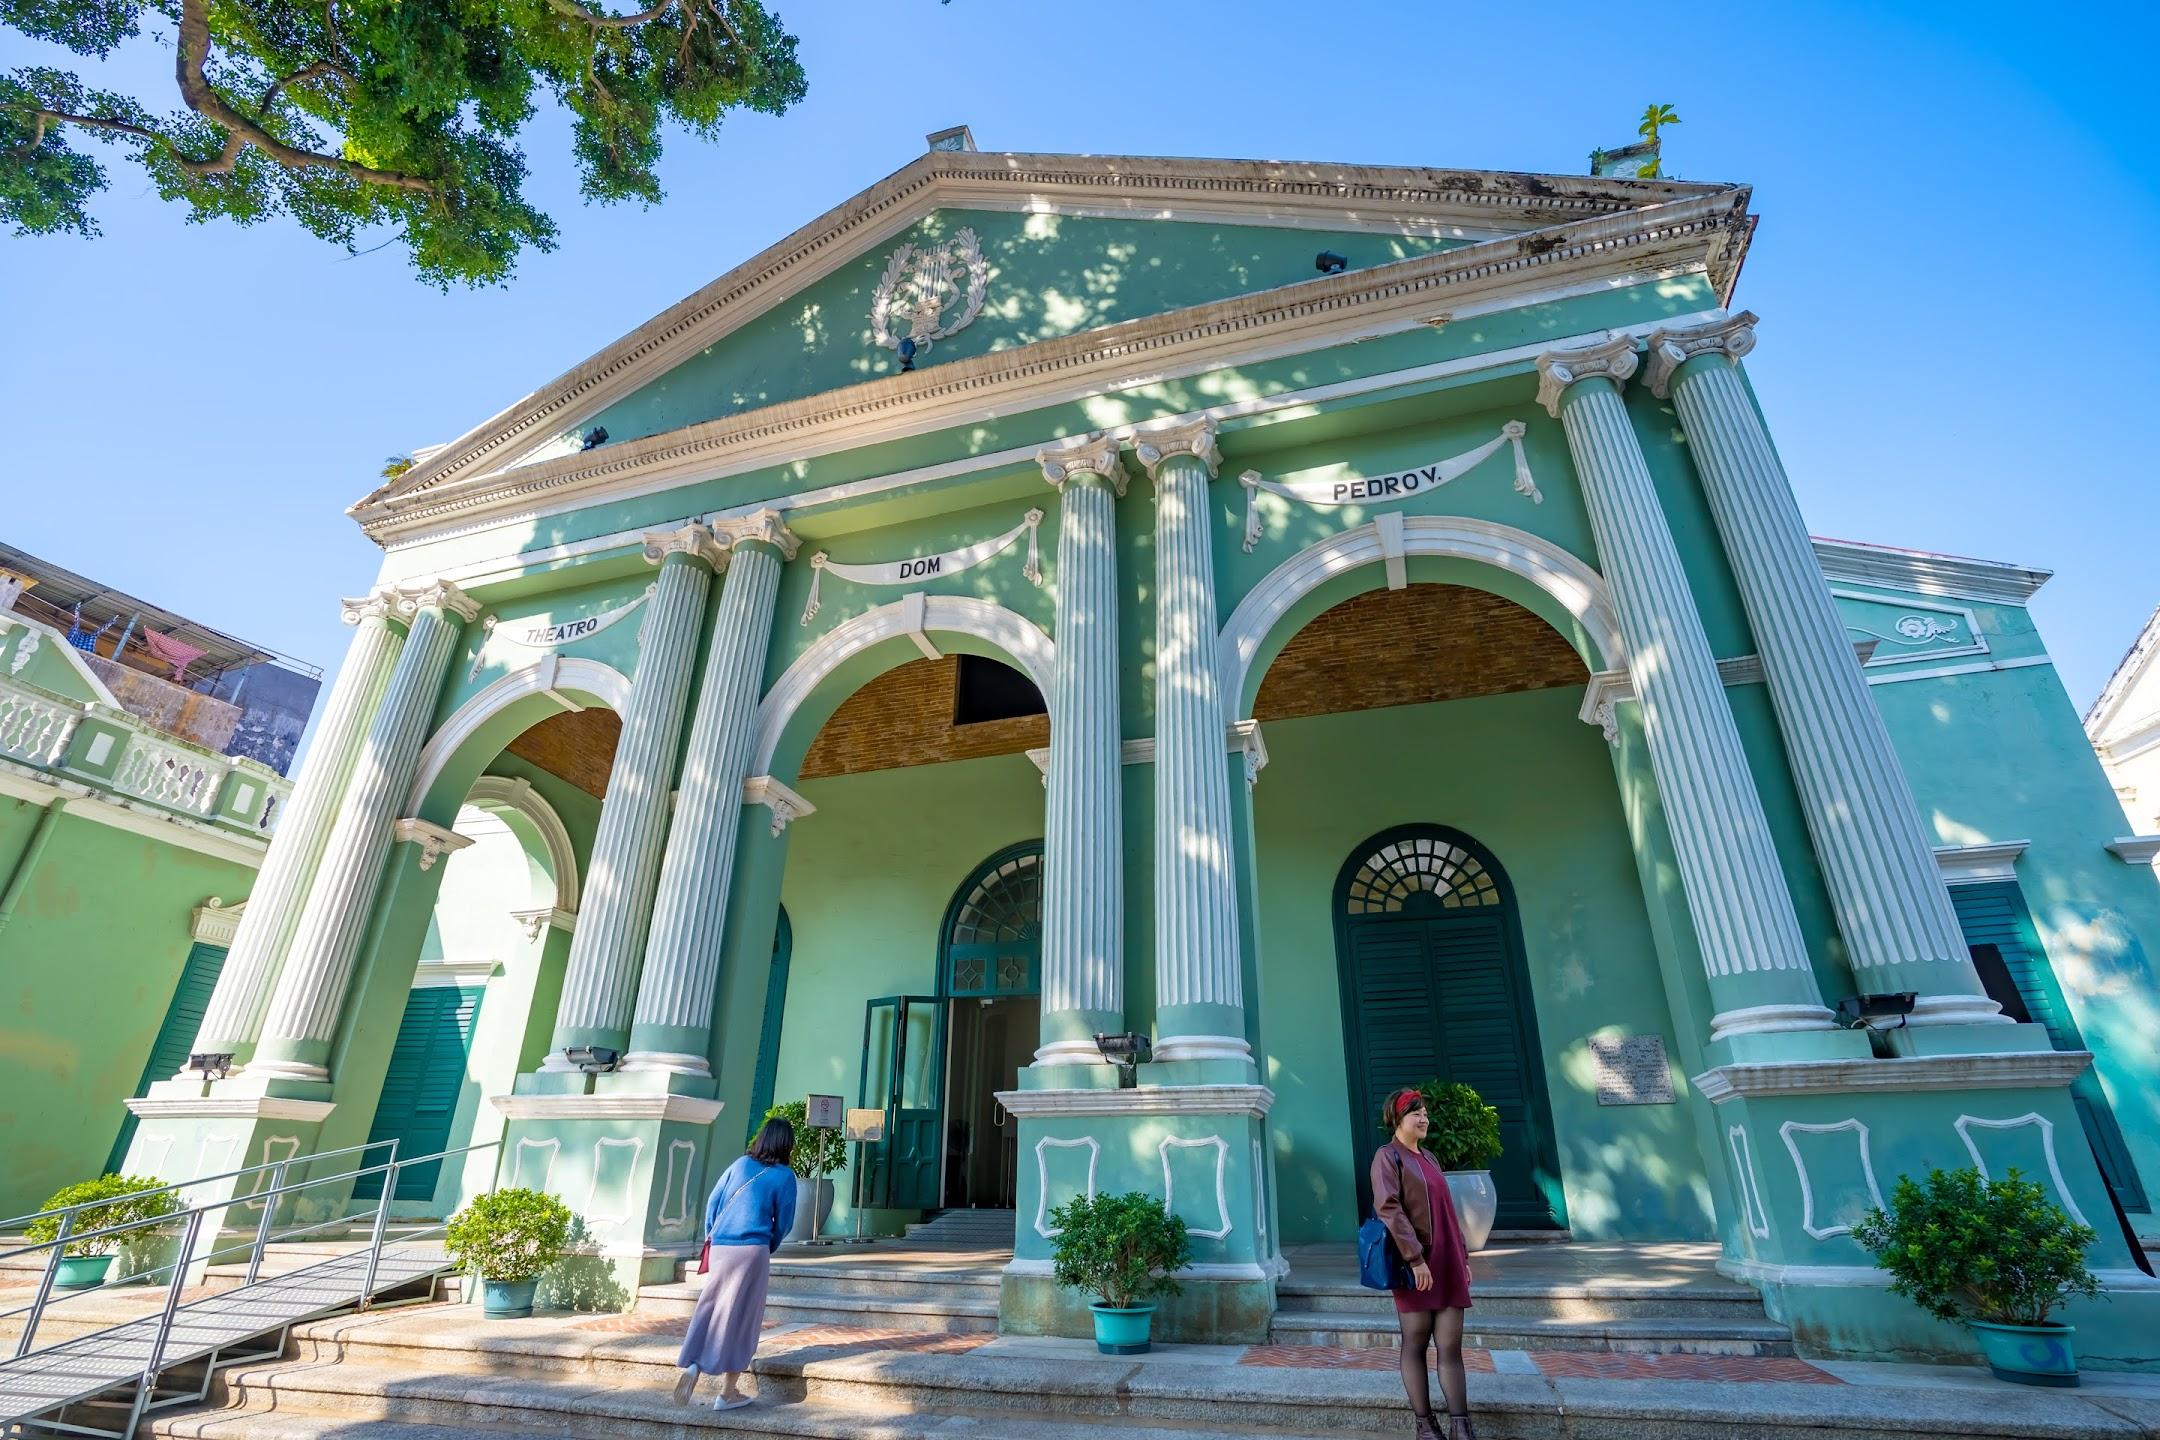 Macau Dom Pedro V Theatre/崗頂劇院/Teatro D. Pedro V